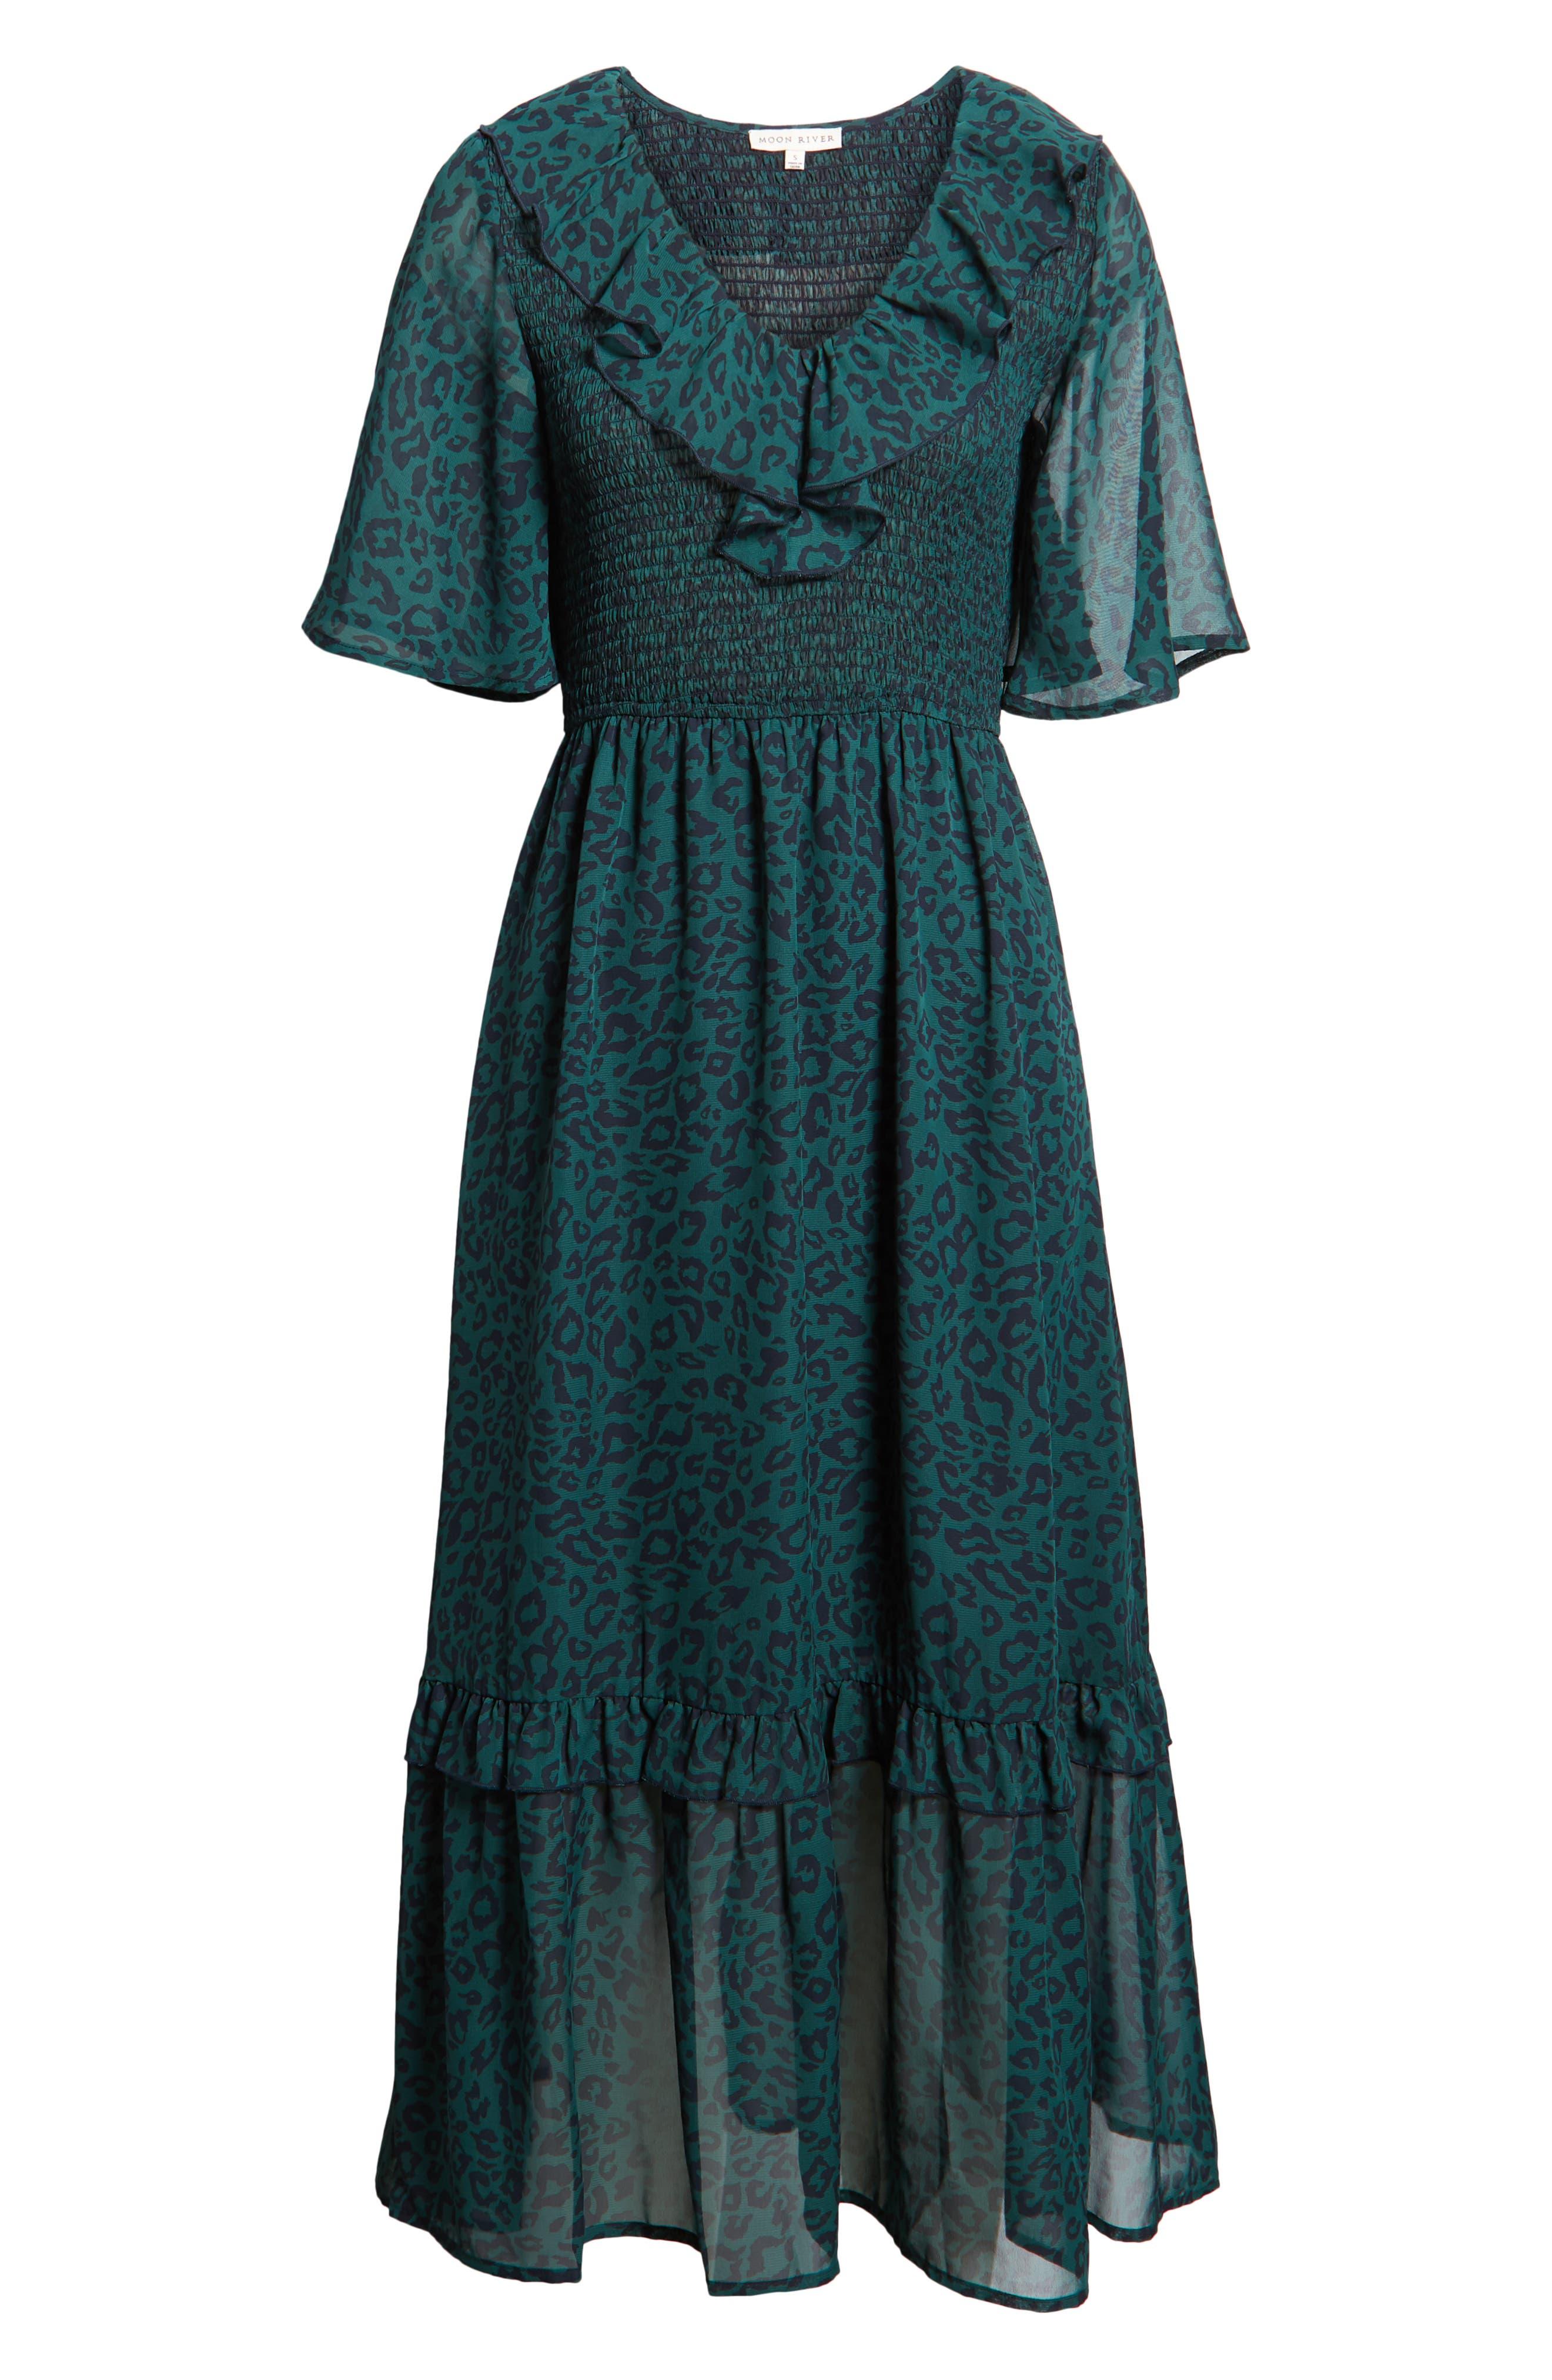 Leopard Print Smocked Dress,                             Alternate thumbnail 7, color,                             GREEN LEOPARD